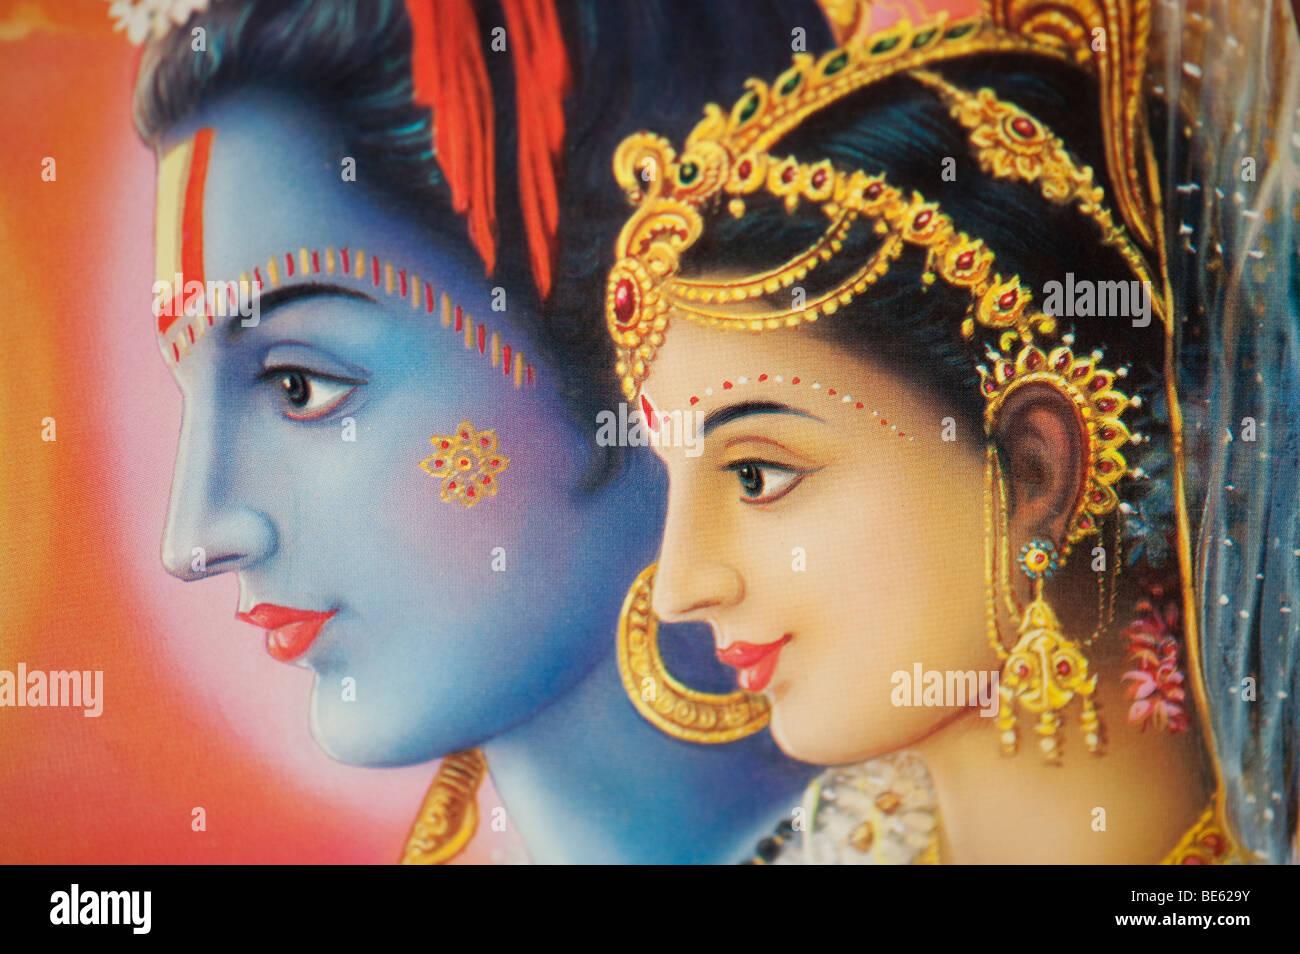 Hindu god lord rama and sita depicted on an indian poster india hindu god lord rama and sita depicted on an indian poster india freerunsca Choice Image